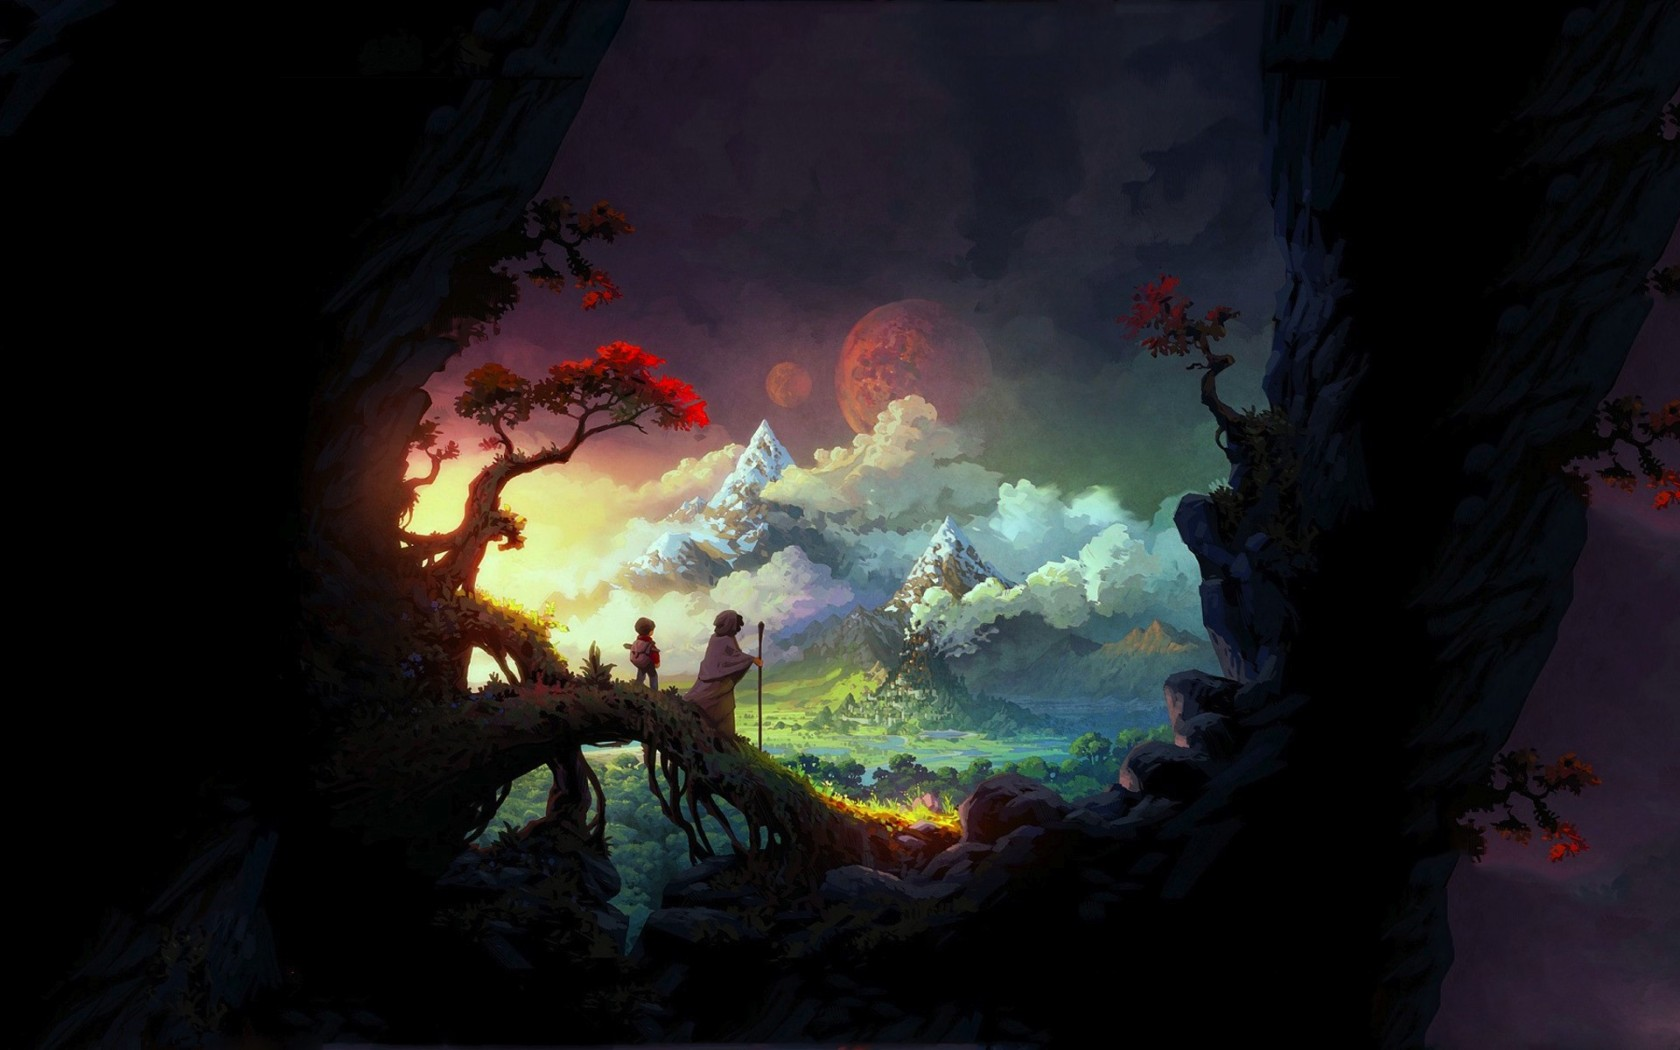 Children in a Fantasy World widescreen wallpaper | Wide-Wallpapers NET